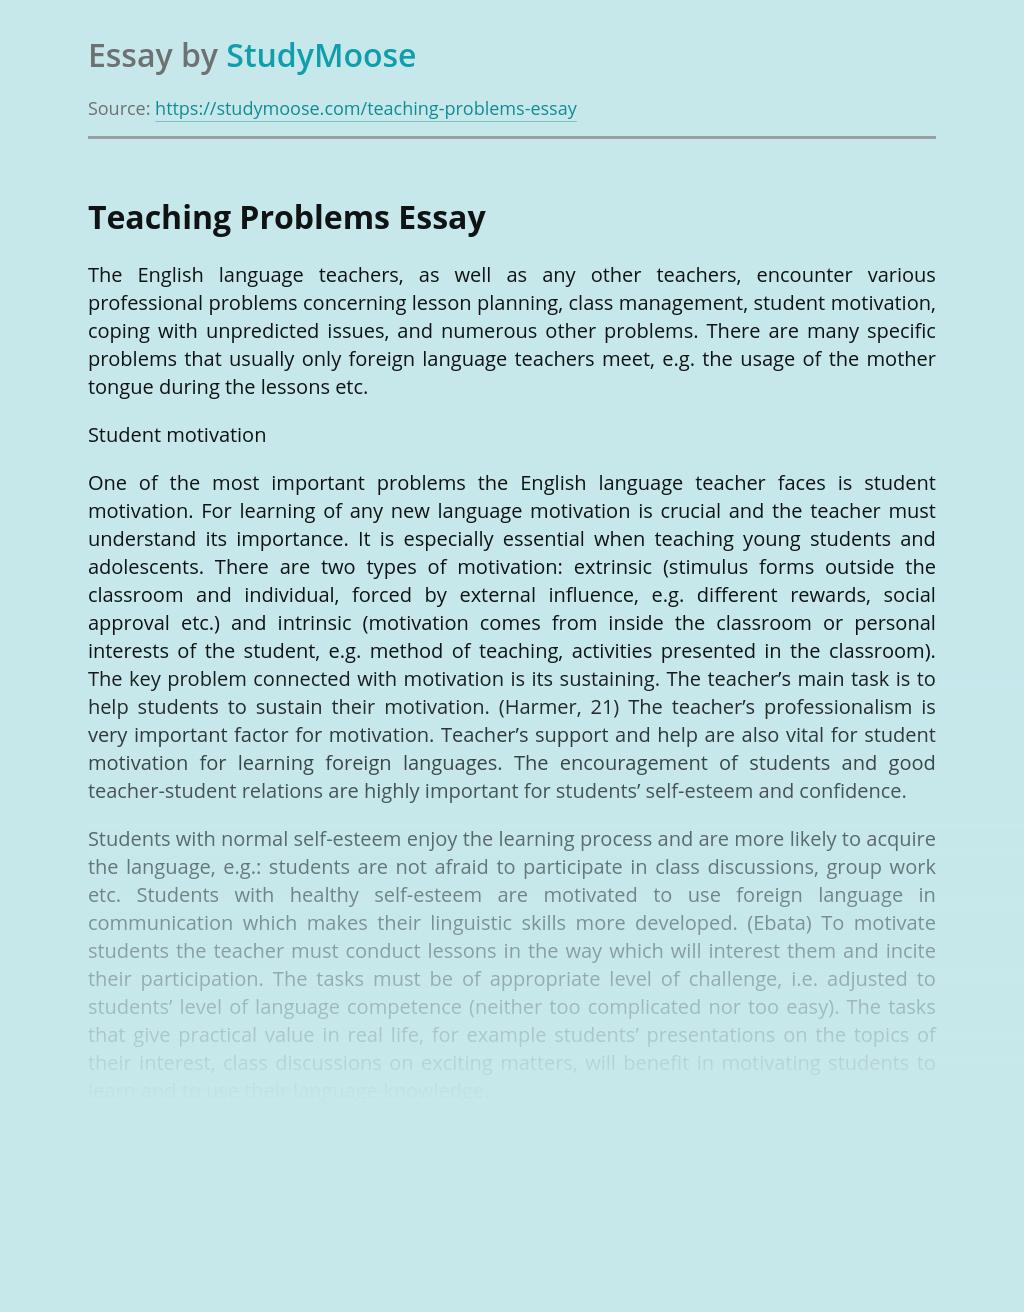 Teaching Problems